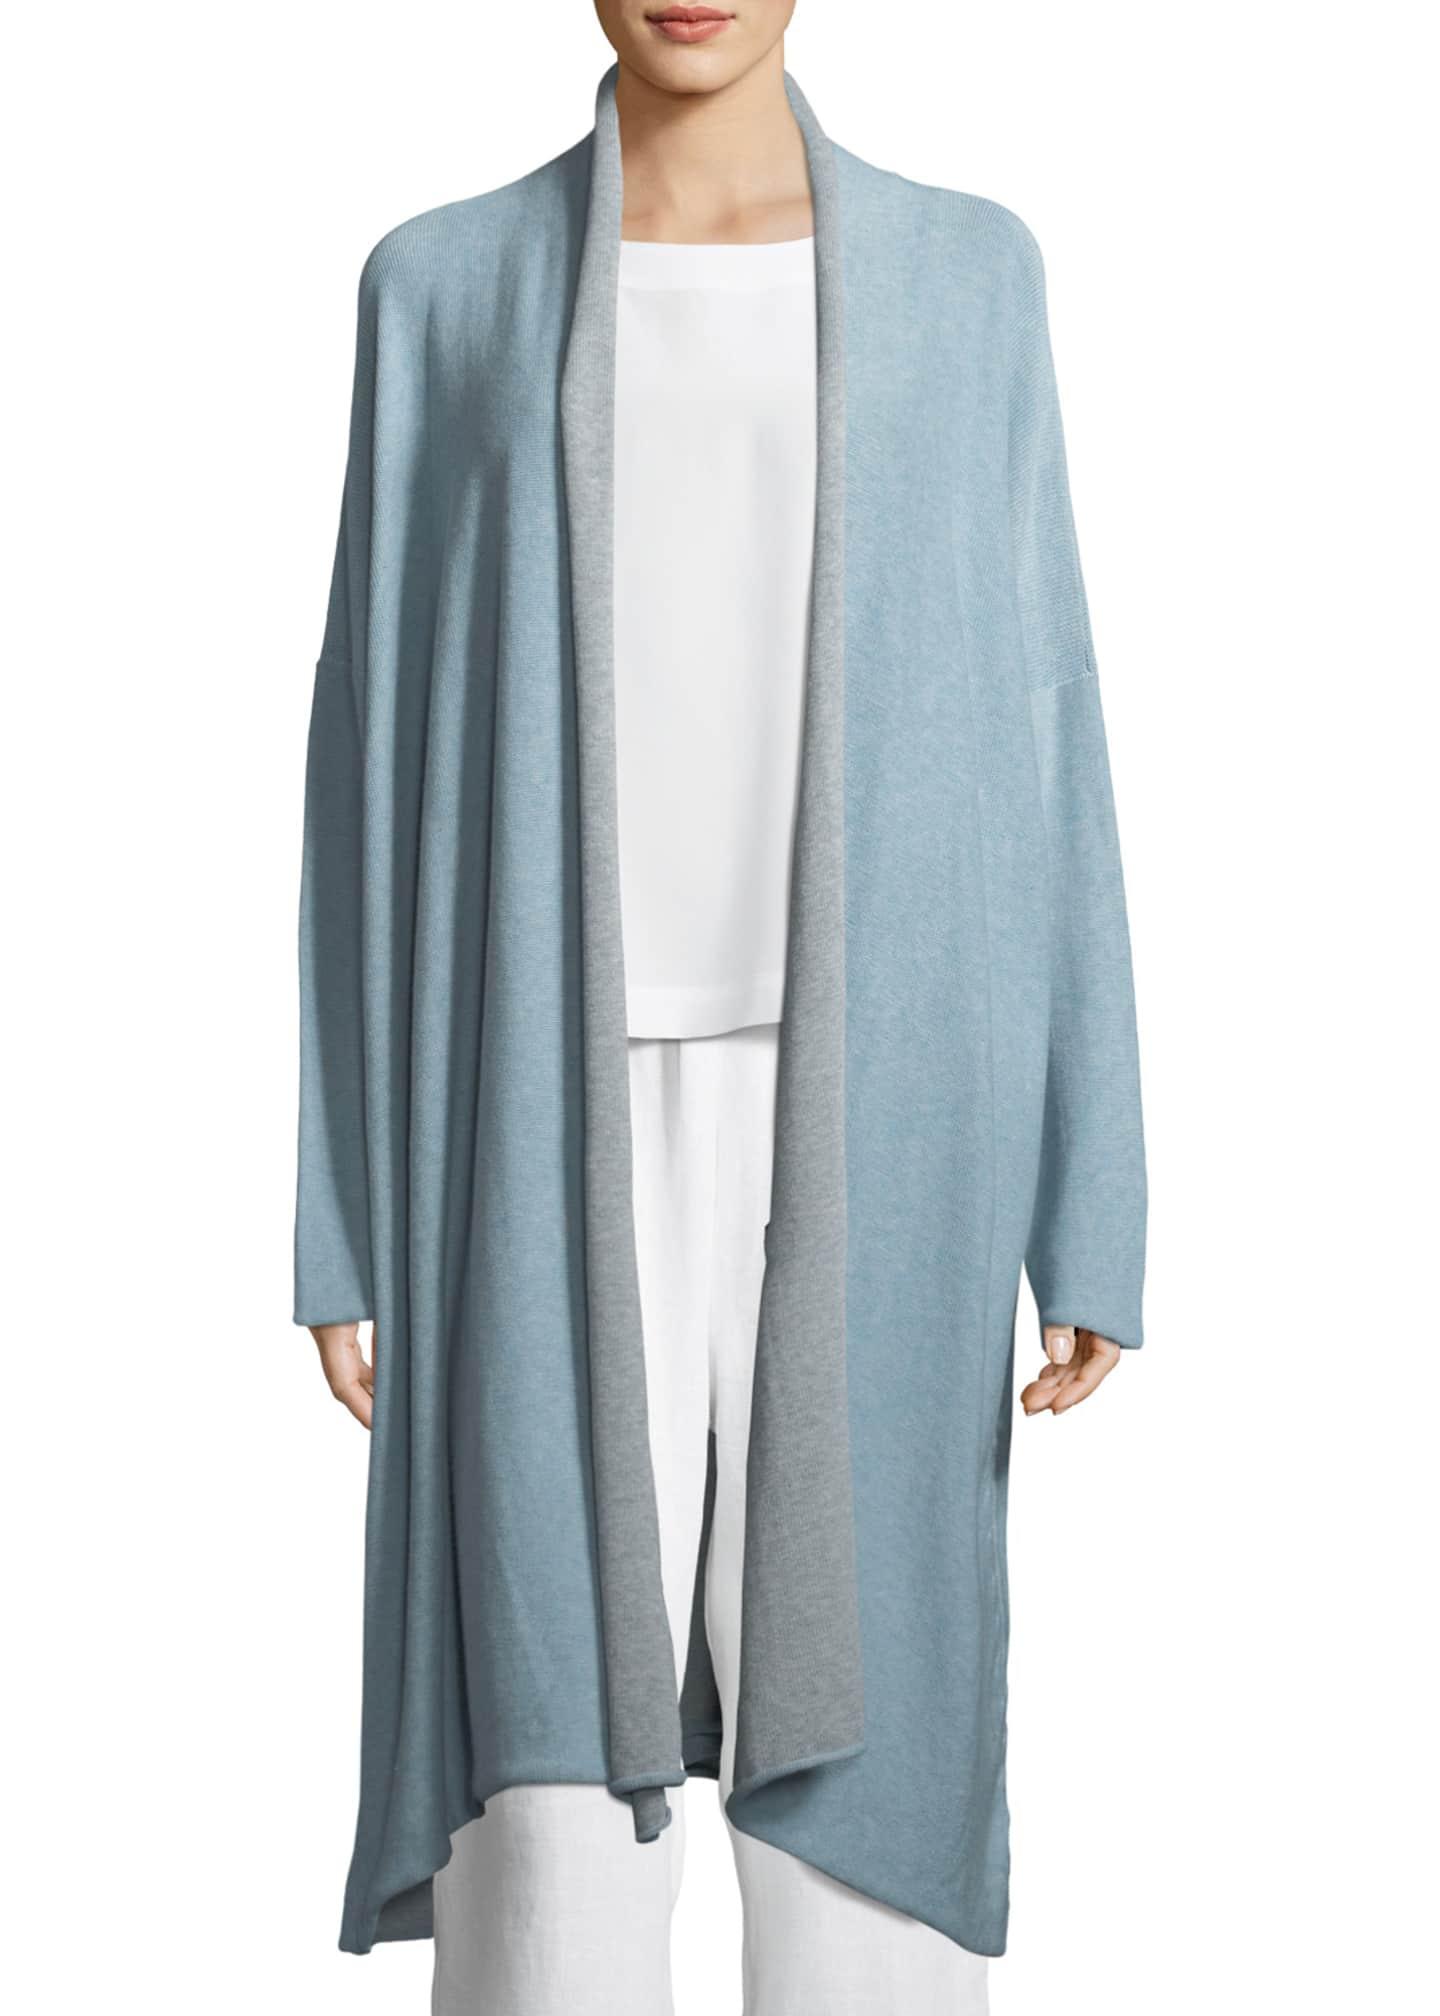 Eskandar Two-Tone Lightweight Cotton Scrunched Long Shawl